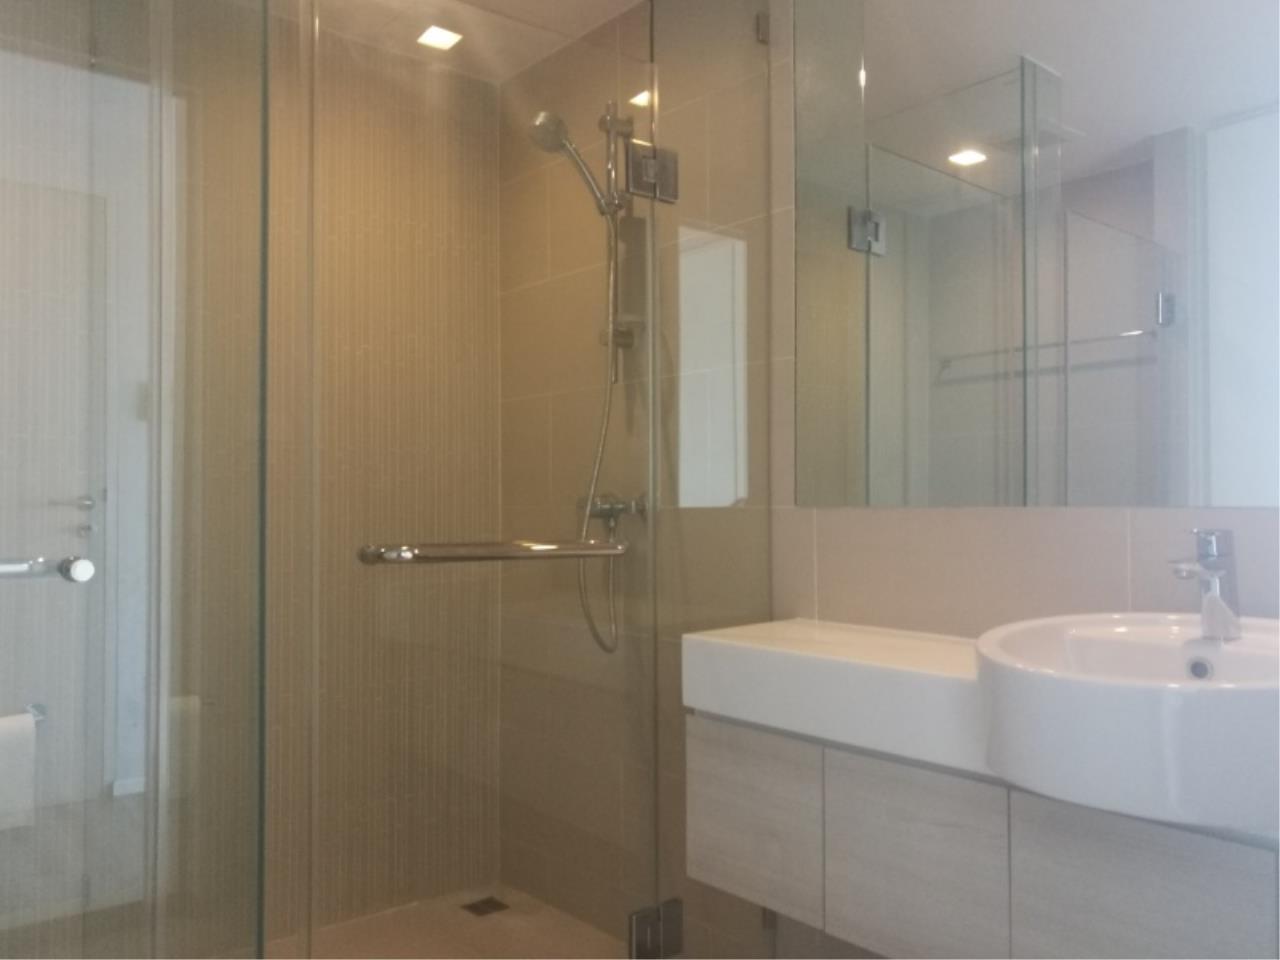 Century21 Skylux Agency's Double Lake Muang Thong Thani / Condo For Rent / 2 Bedroom / 57 SQM / Mueng Thong Thani / Bangkok 9